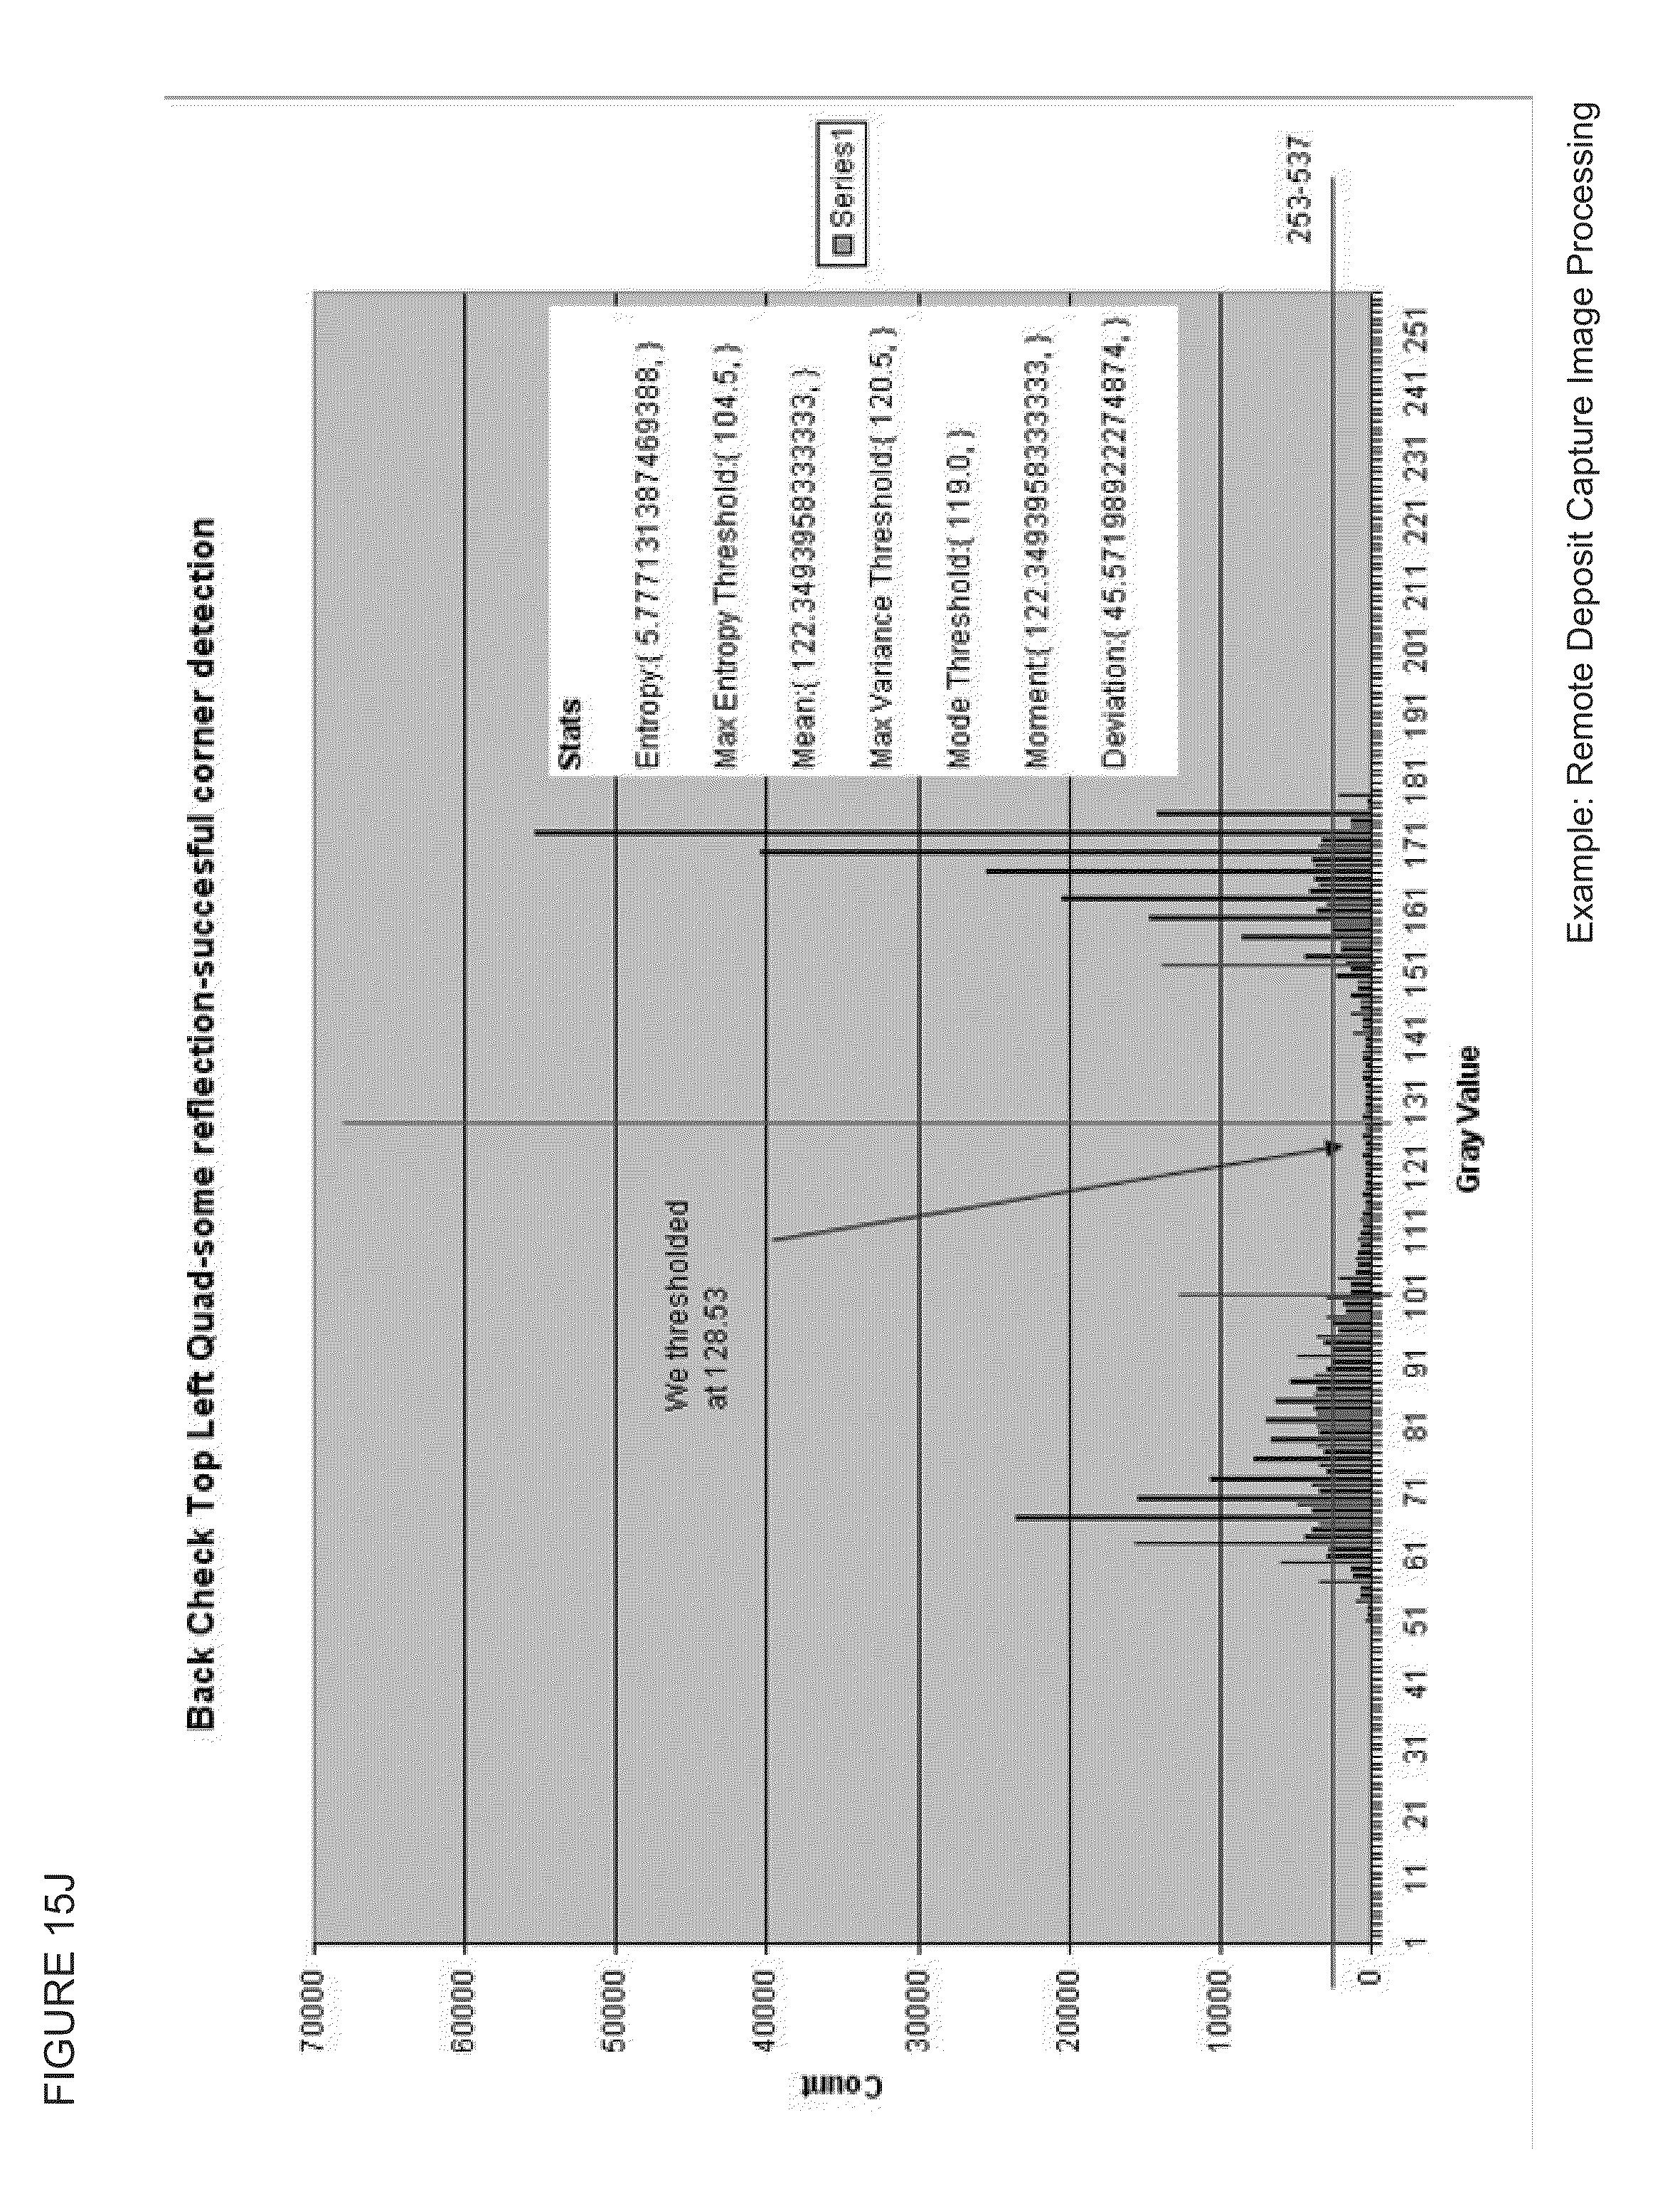 Patent US 8,837,806 B1